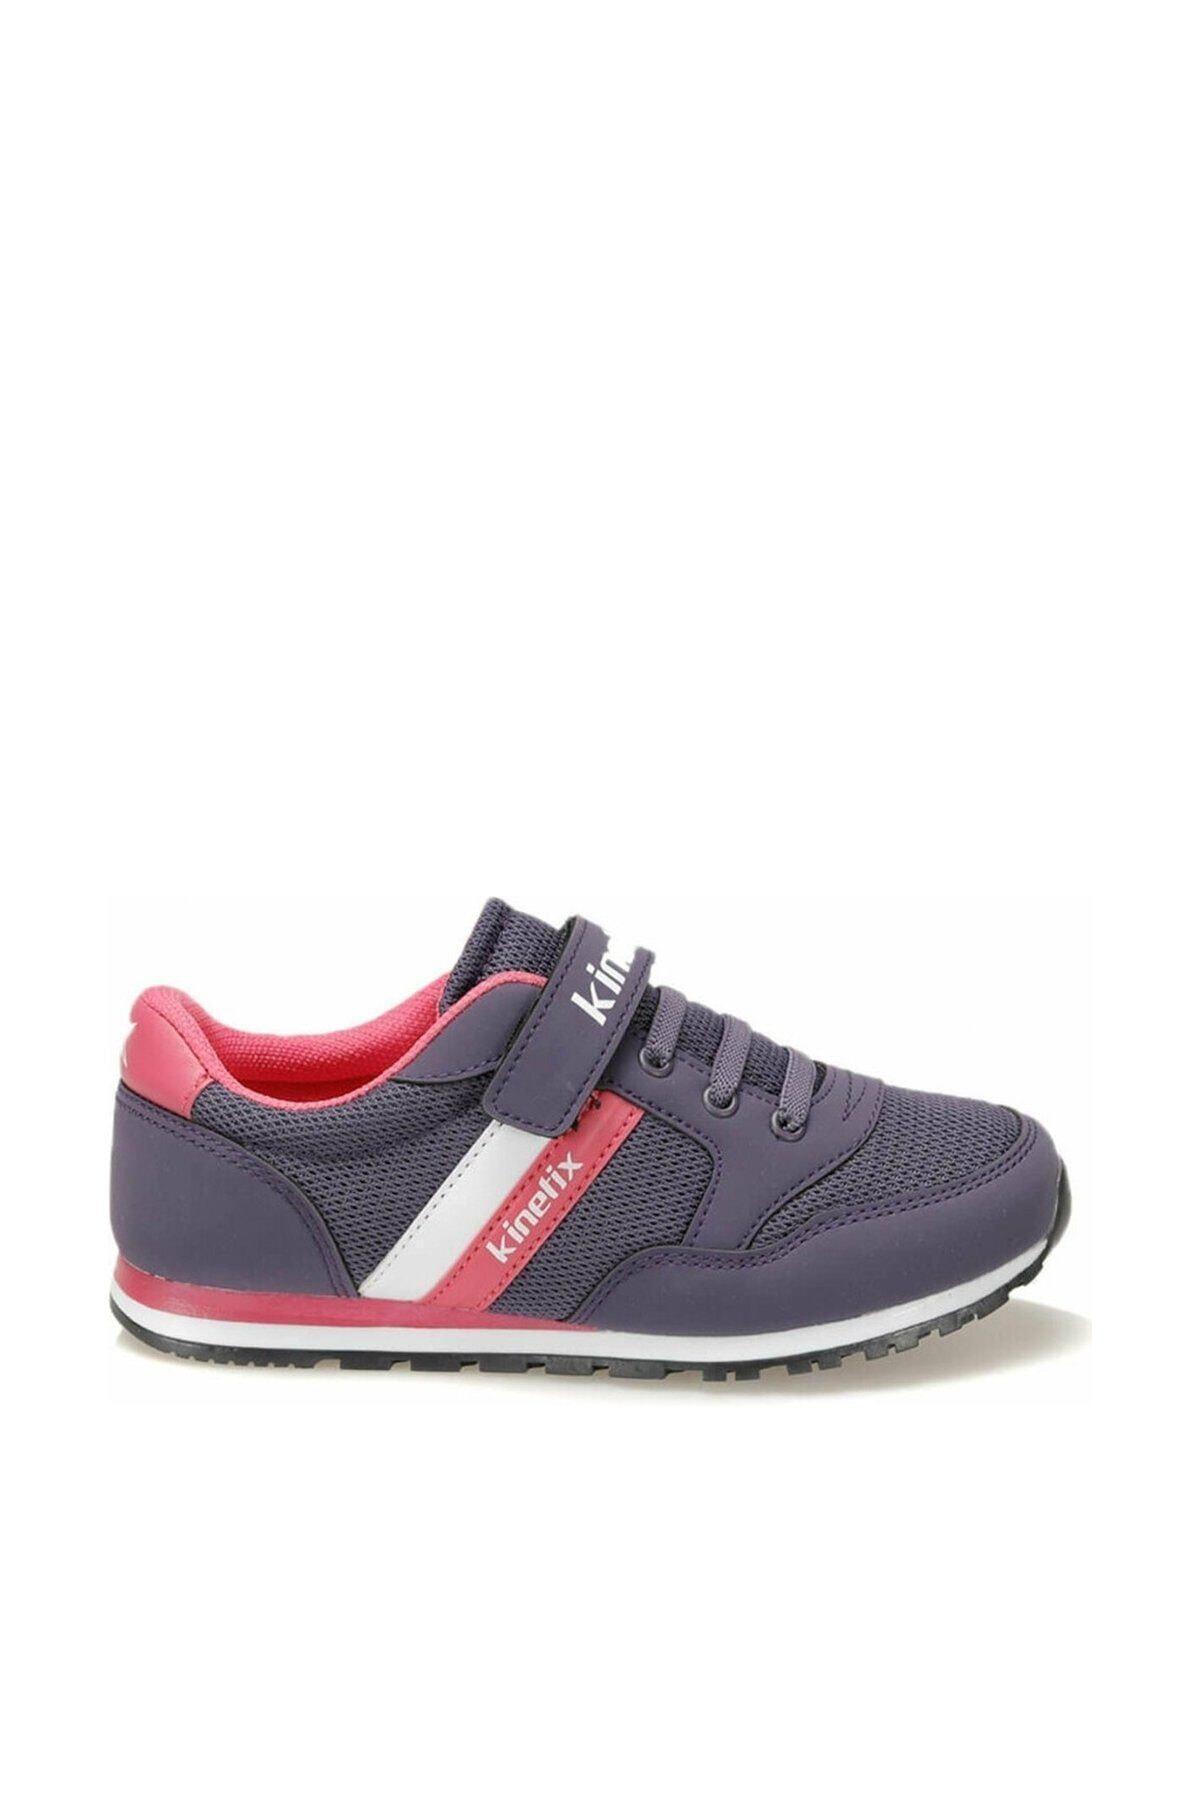 Kinetix PAYOF Mor Fuşya Beyaz Kız Çocuk Sneaker 100294193 2